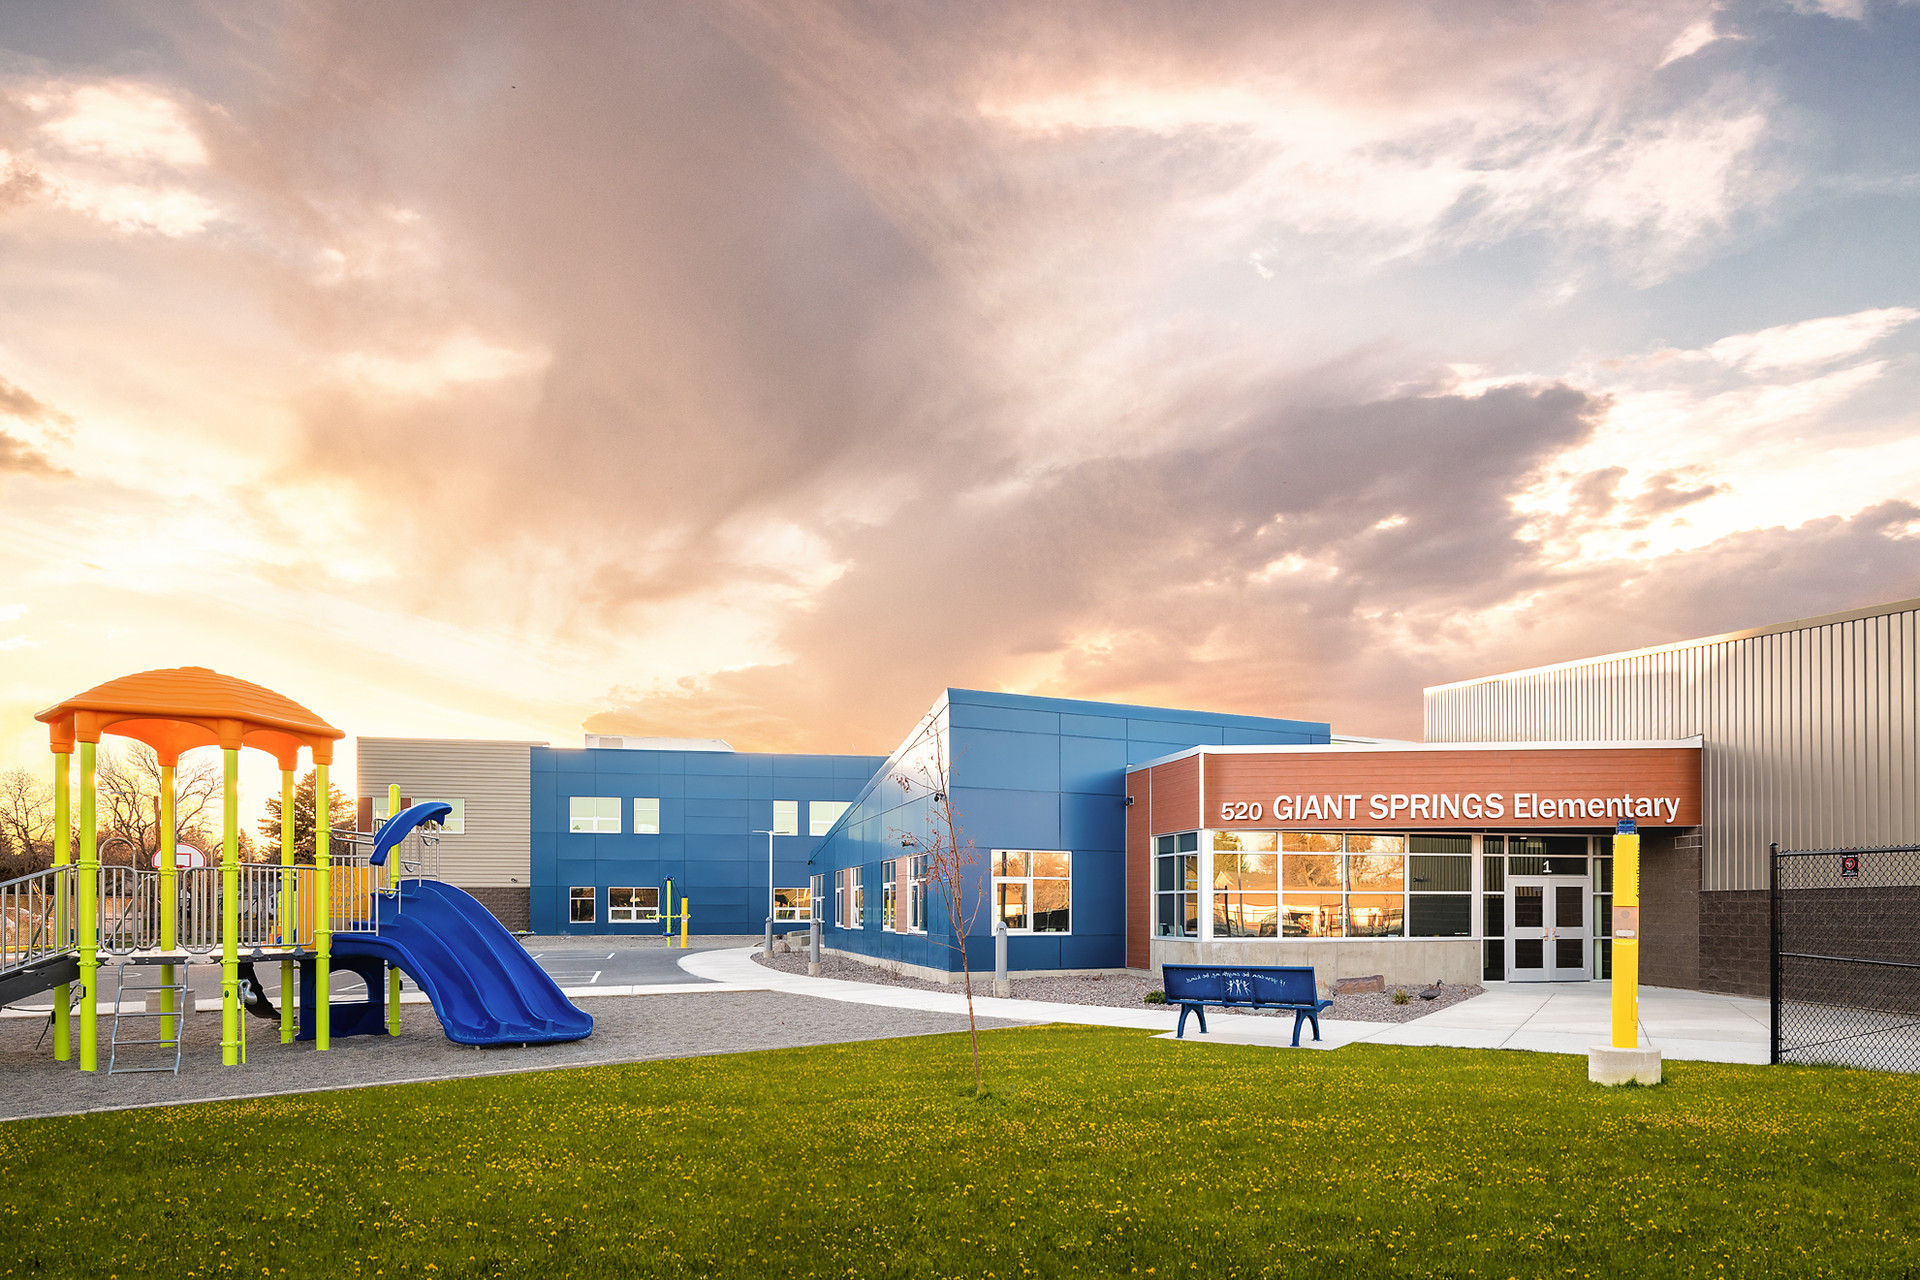 Giant-Springs-Elementary---Low-Resolutio